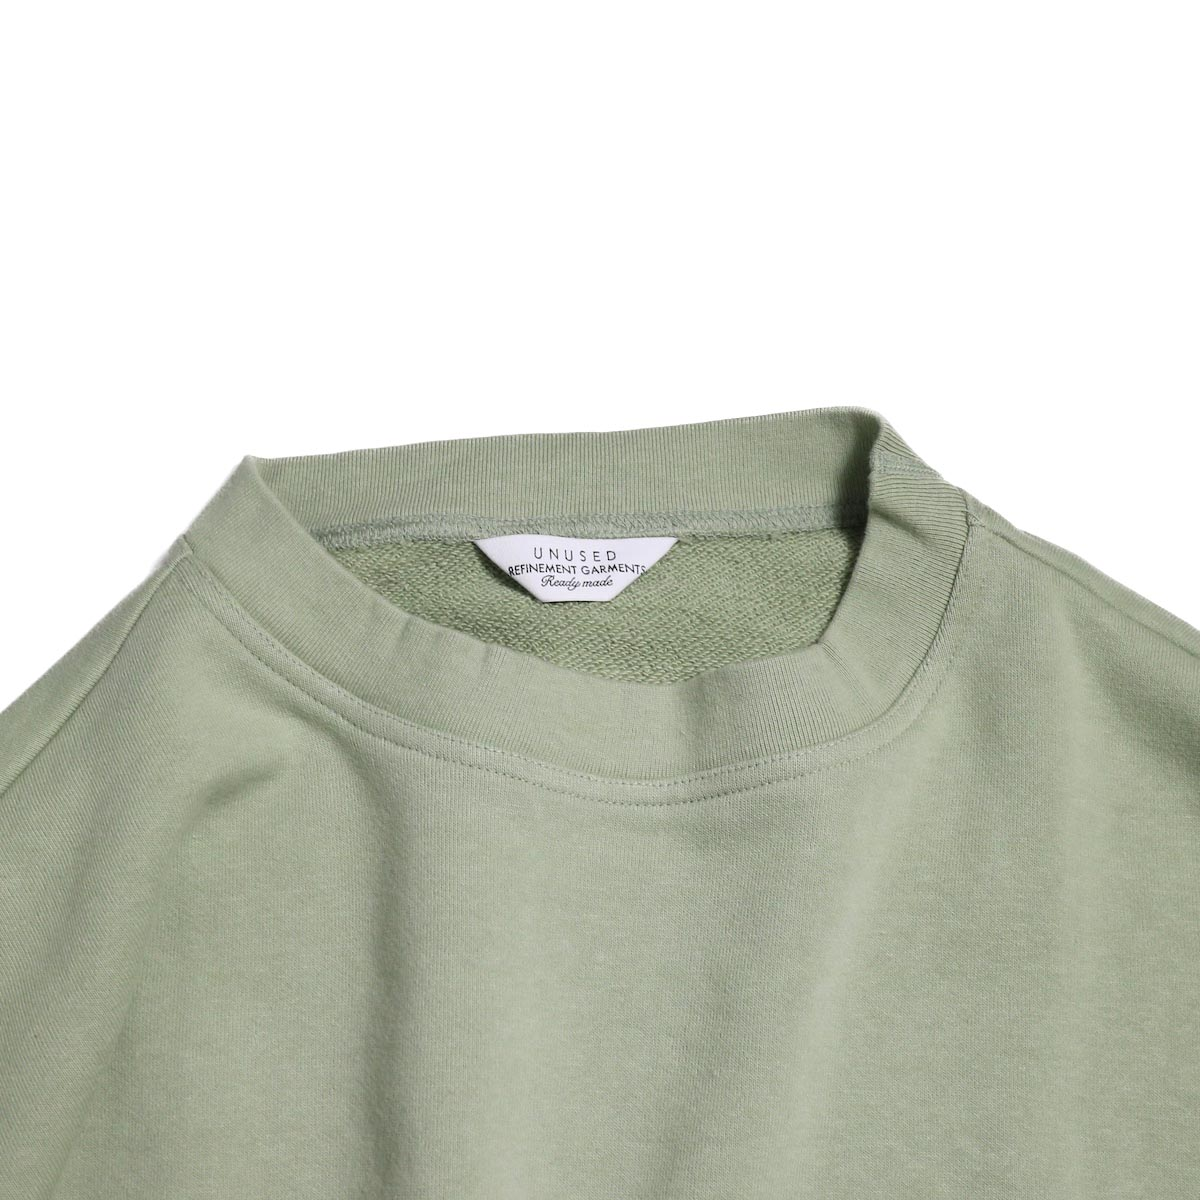 UNUSED / US1530 Crew Neck Sweat Shirt -SAGE GREEN 首周り